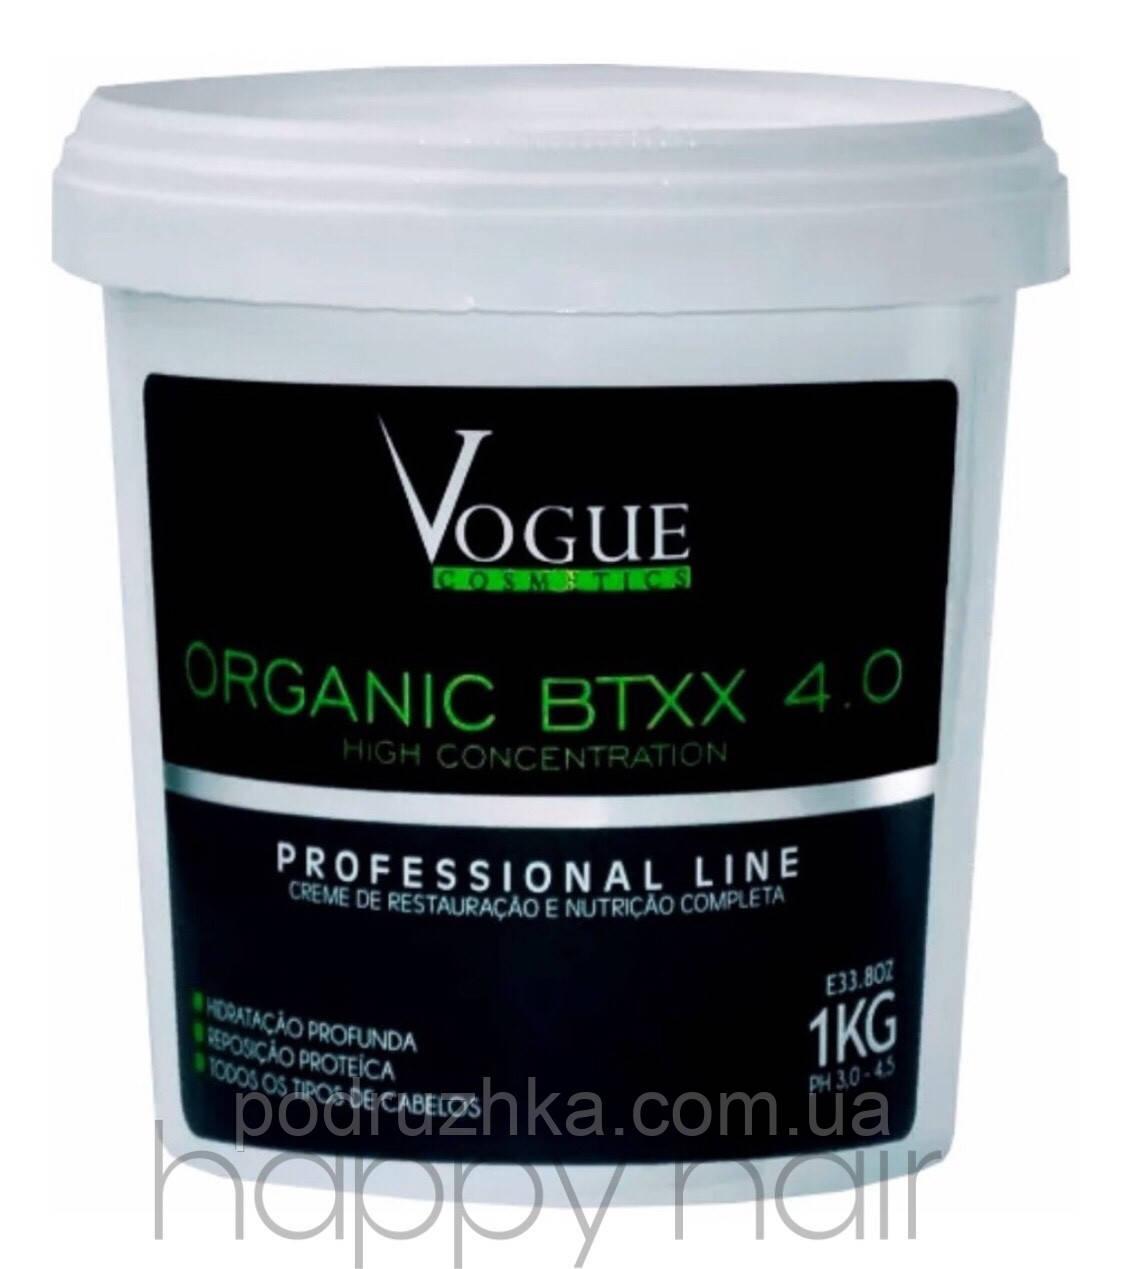 Vogue Cosmetics Botox Orgânico Btxx 4.0 Ботокс для волос 1000 мл